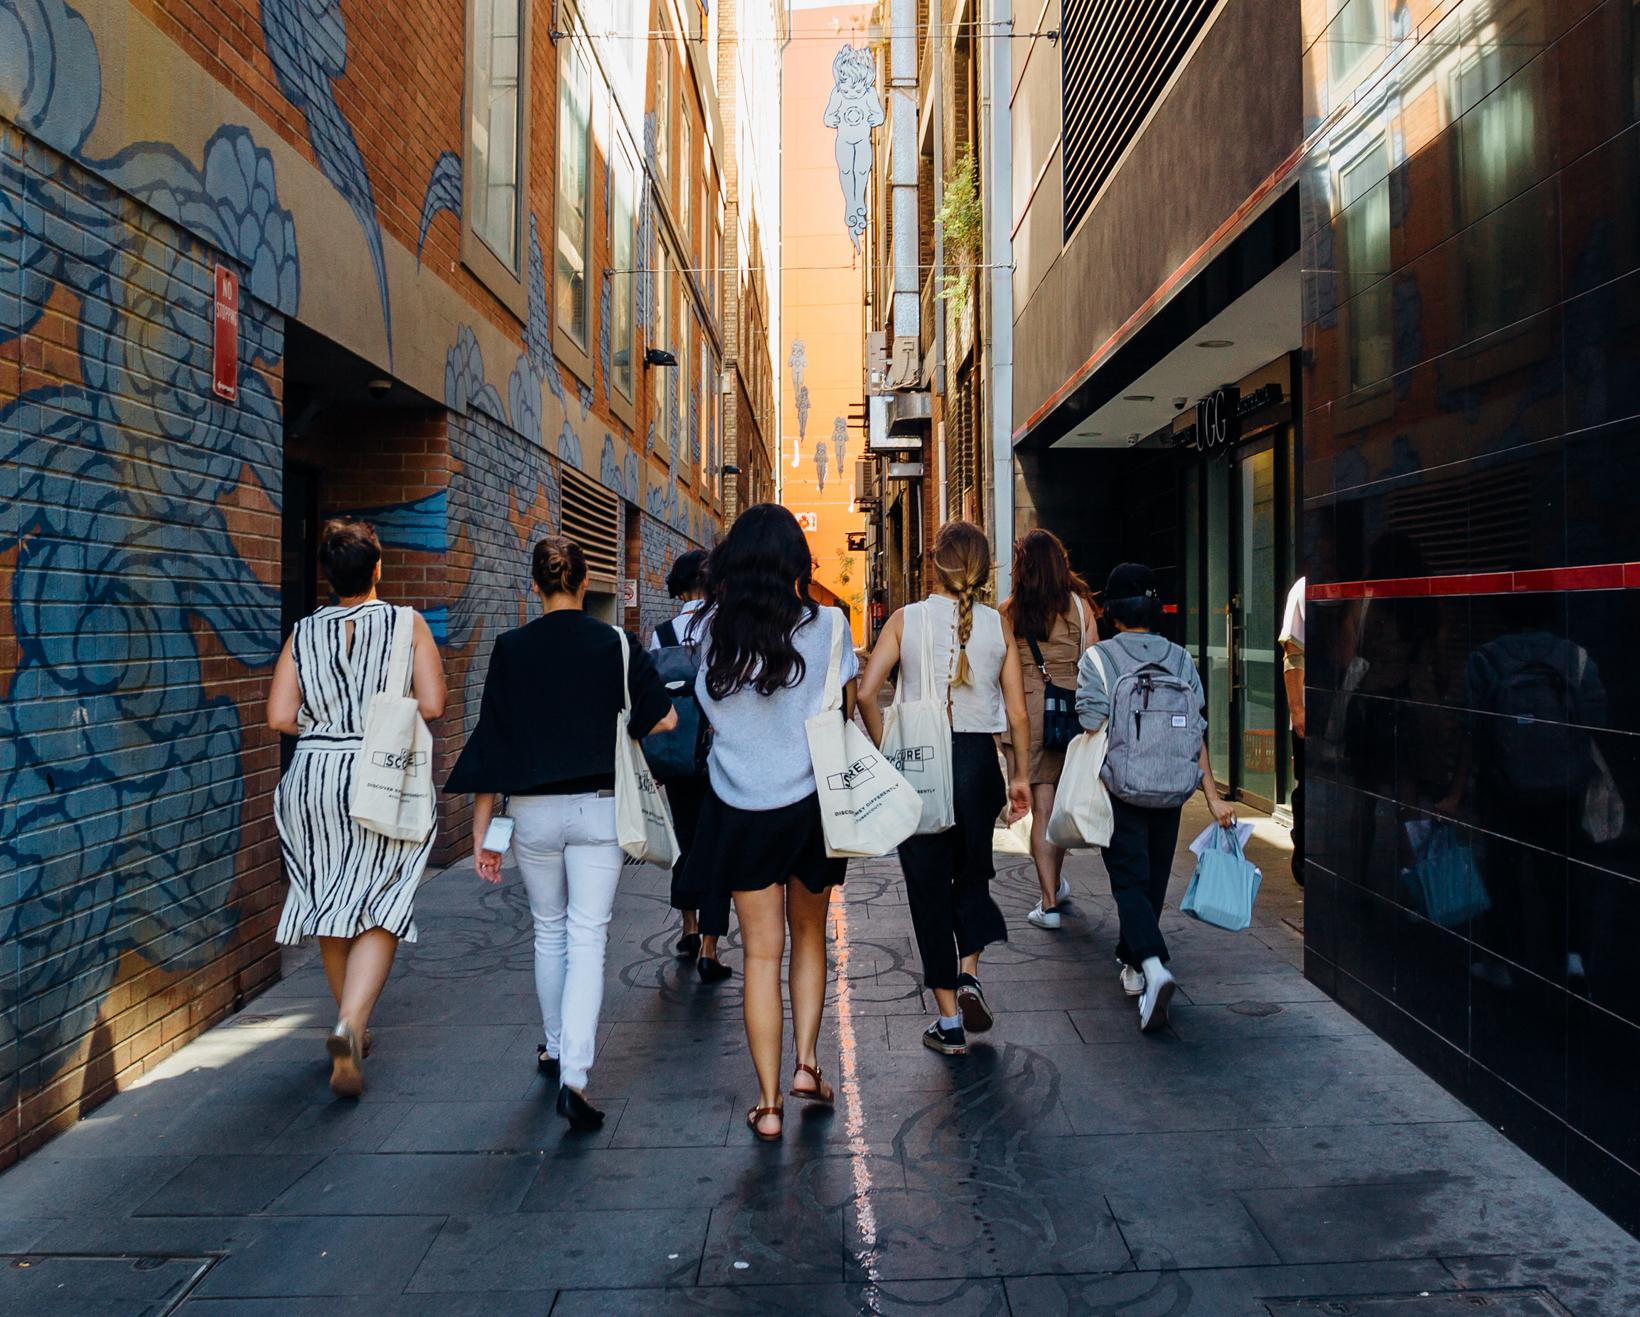 SYDNEY'S COMMUNITY PROBLEM - THE AUSTRALIAN ART CURATOR BLOG